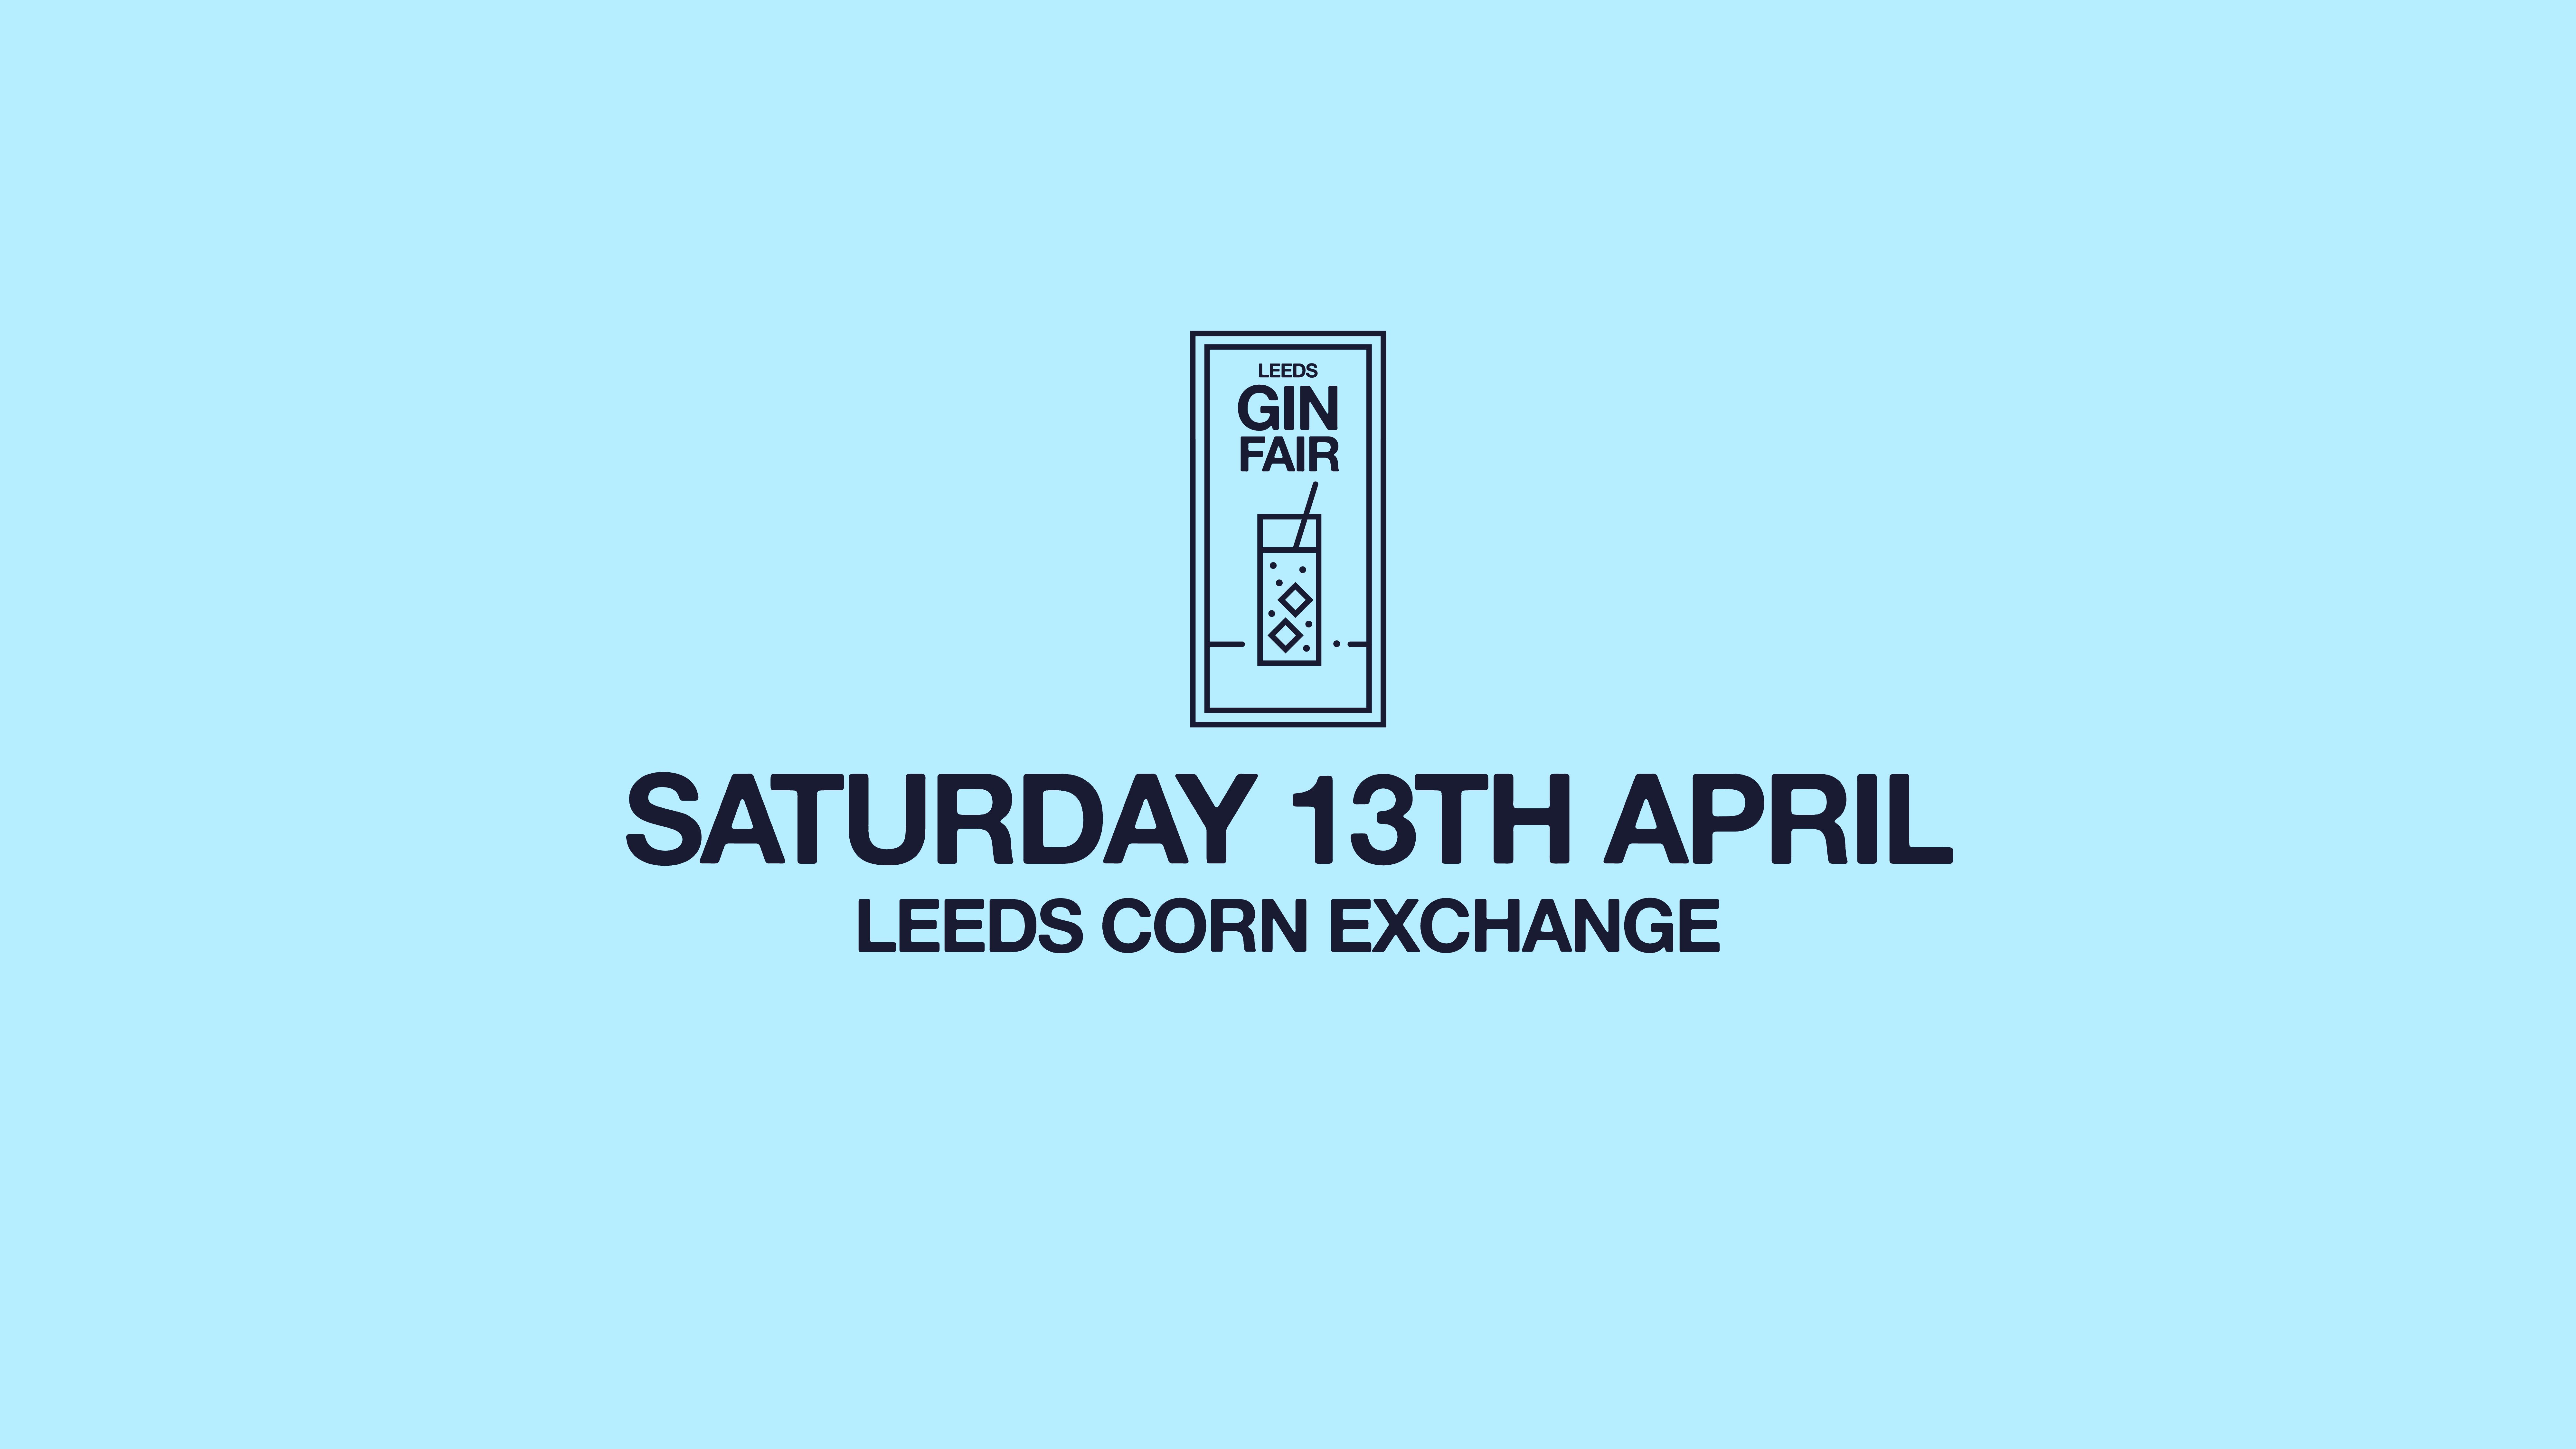 Leeds Gin Fair 2019